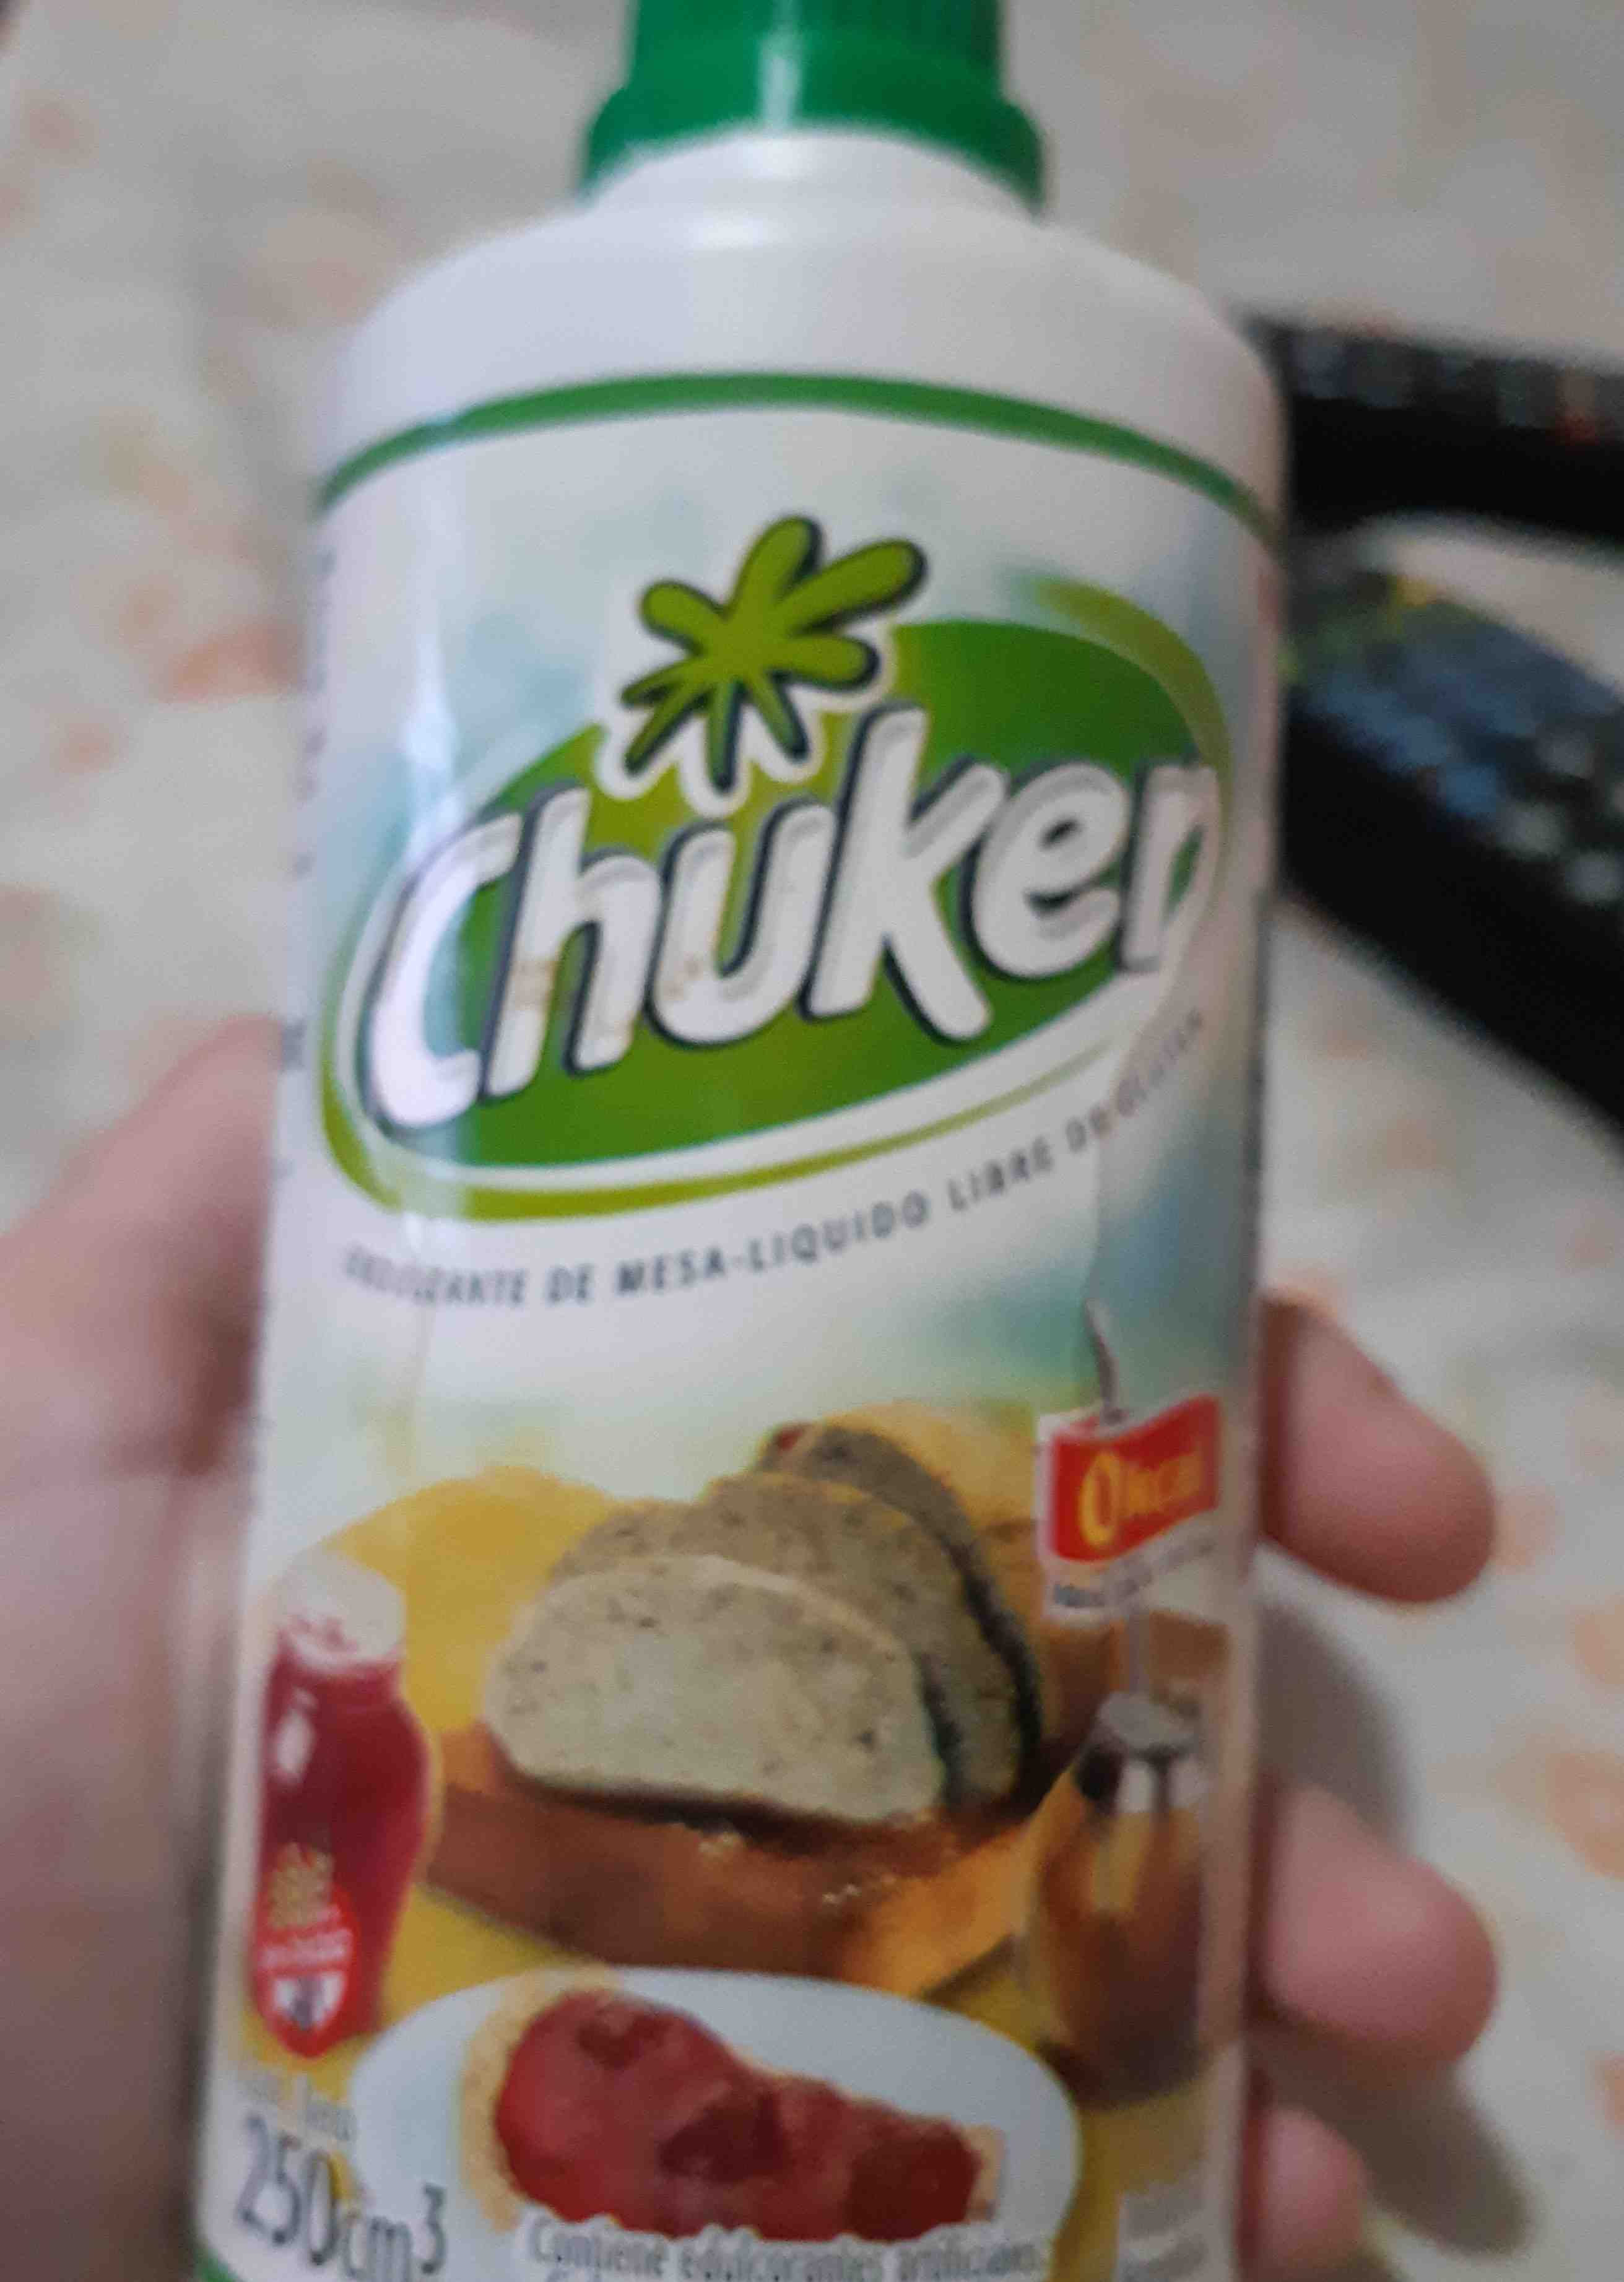 Chuker - Product